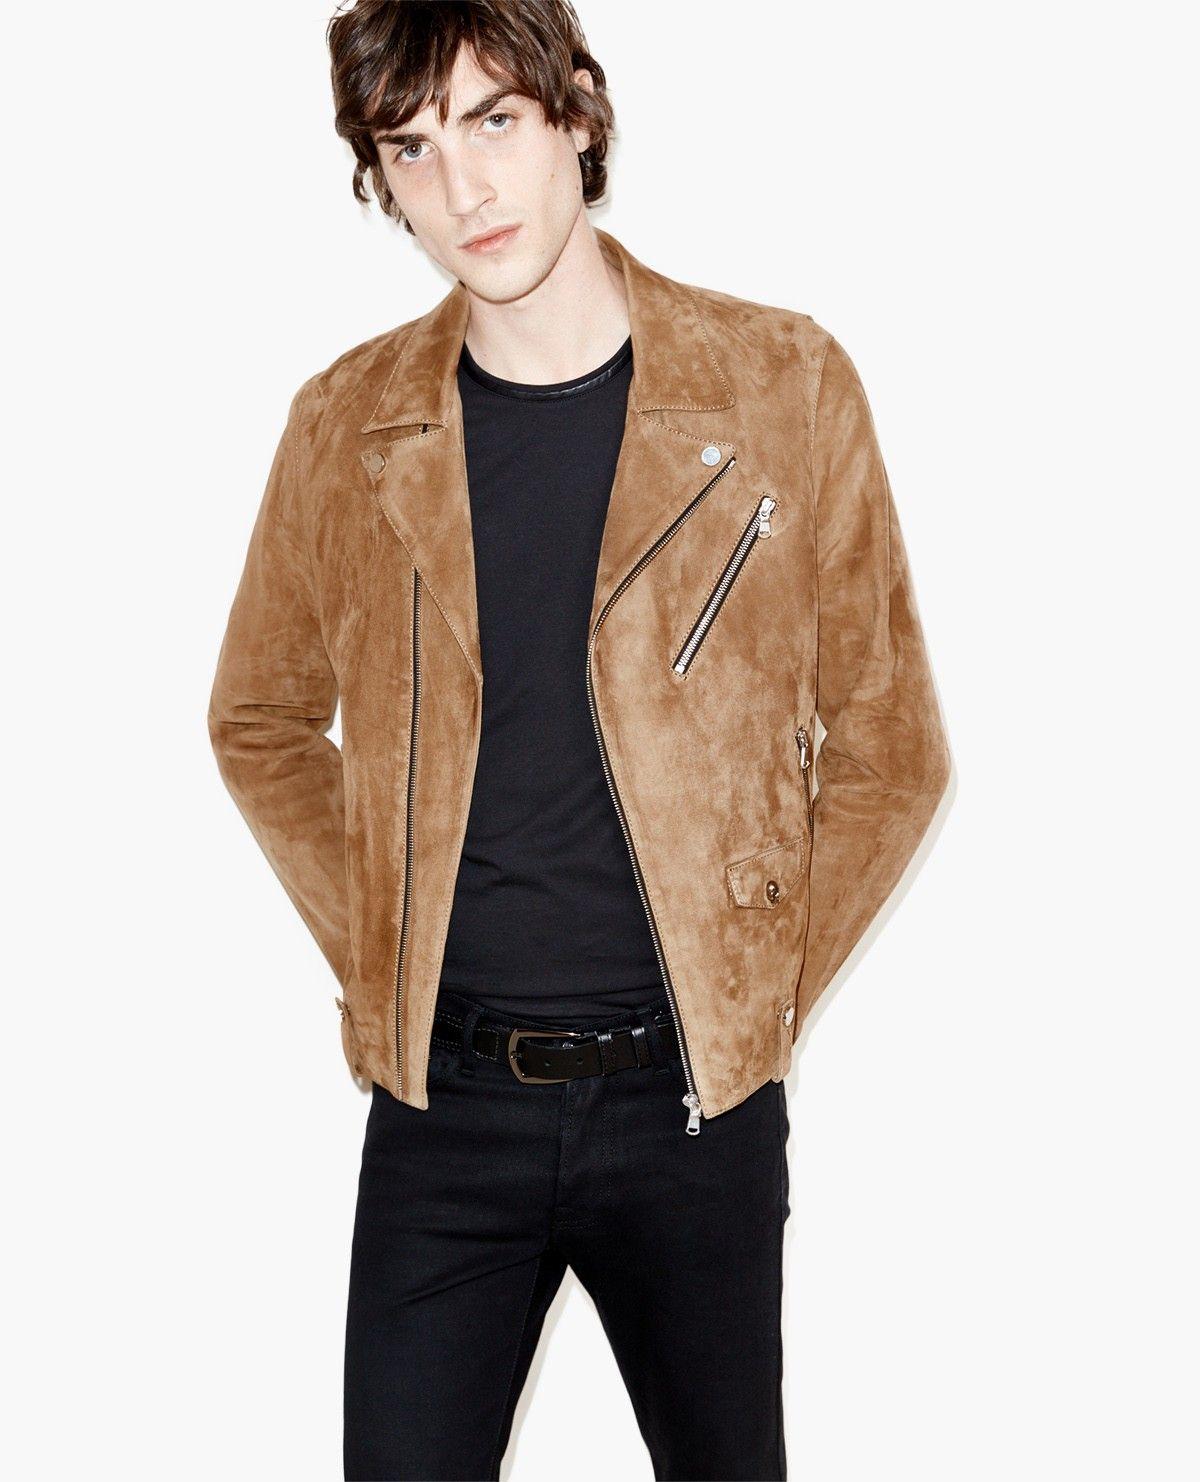 c1a553532e Suede biker jacket - Men - The Kooples   Mens Style   Jackets, Suede ...